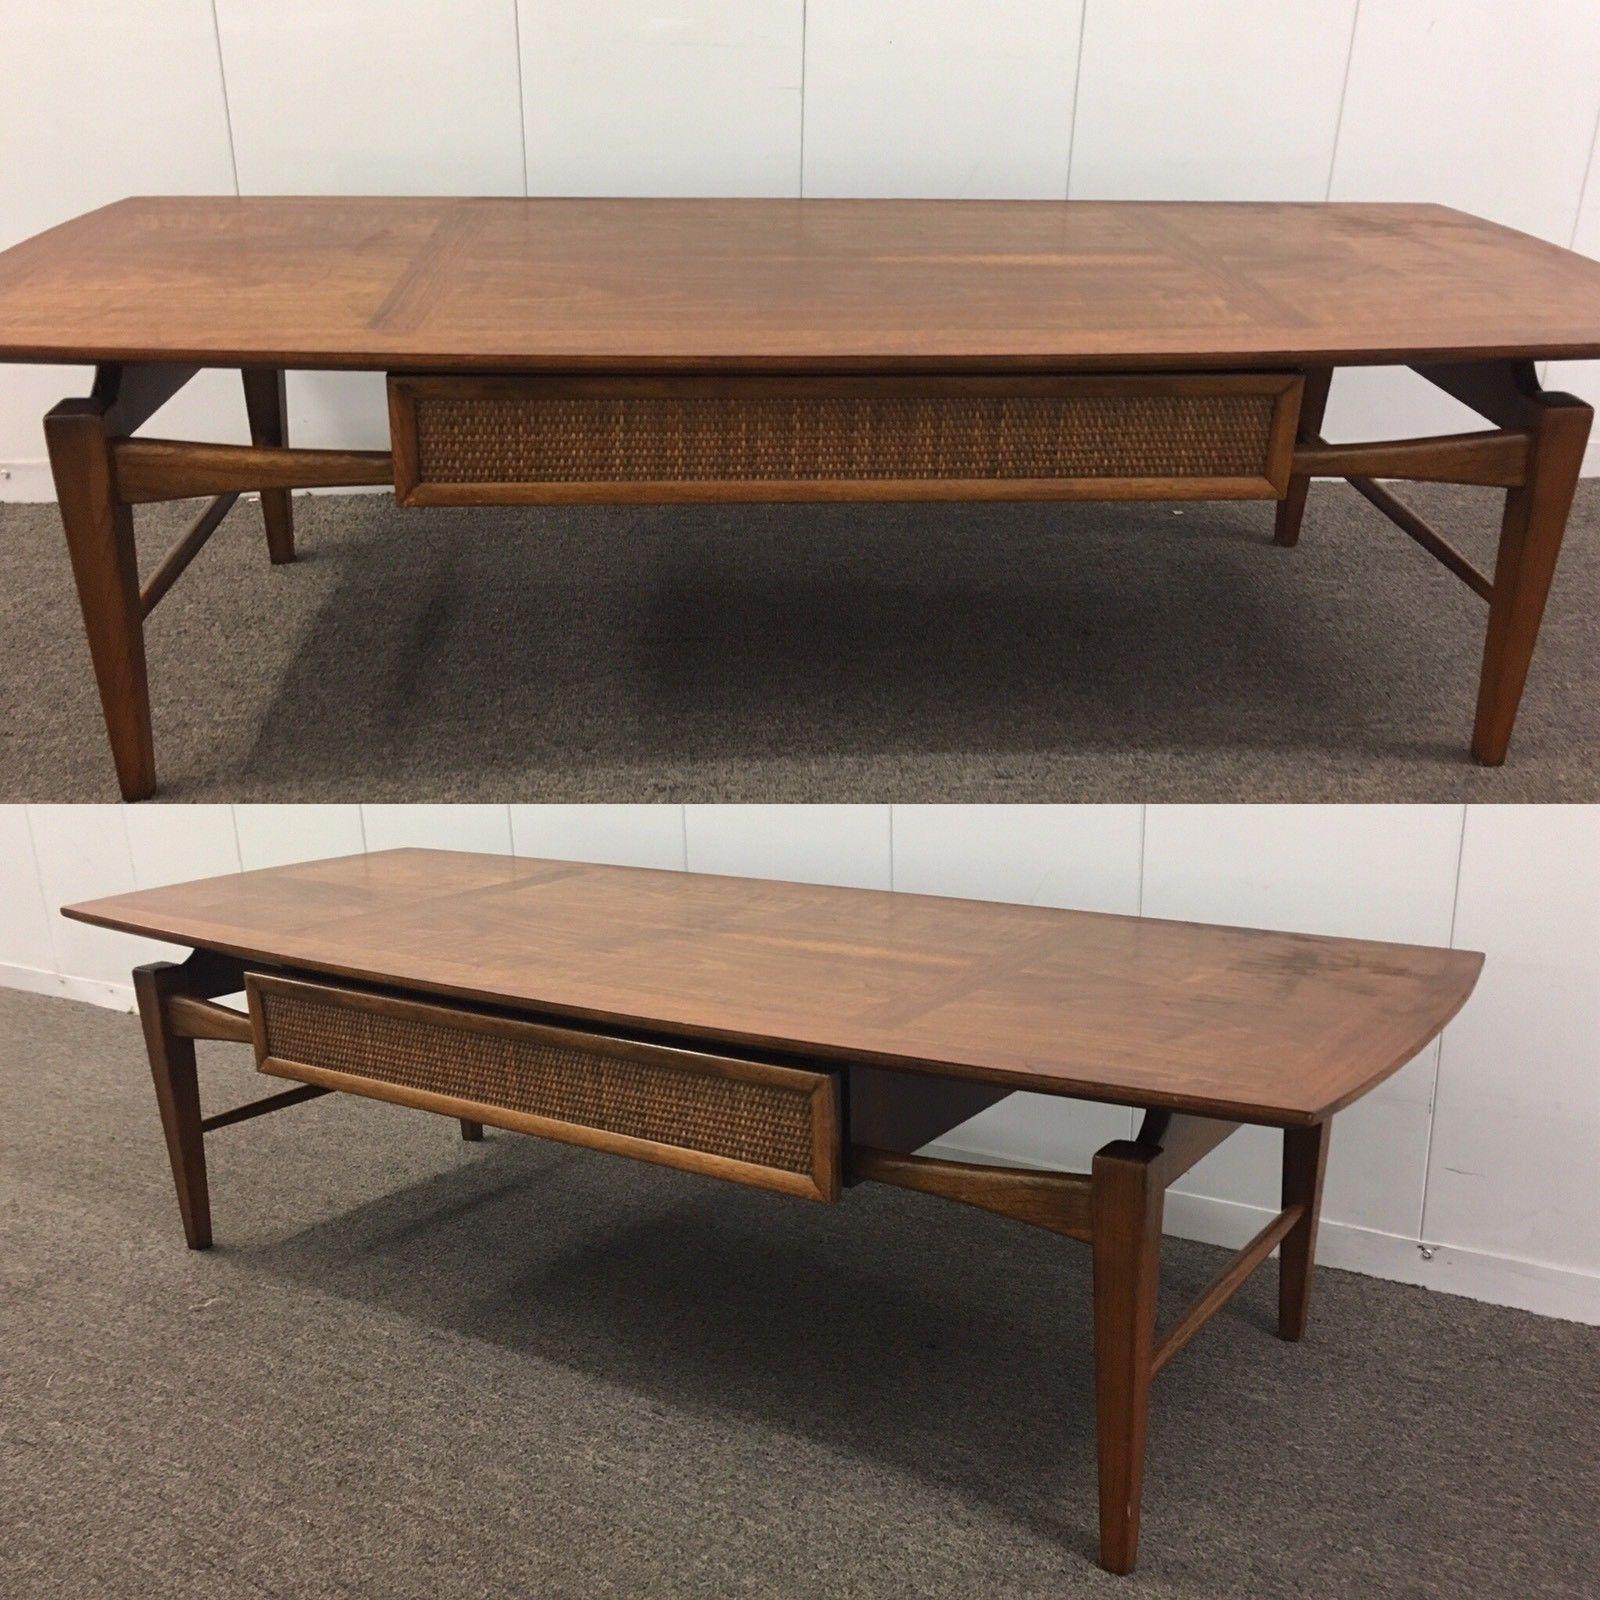 Walnut Mid Century Coffee Table By Lane Esteem Collection Surfboard Mcm 1960s Ebay Mid Century Coffee Table Coffee Table Coffee Table Design [ 1600 x 1600 Pixel ]